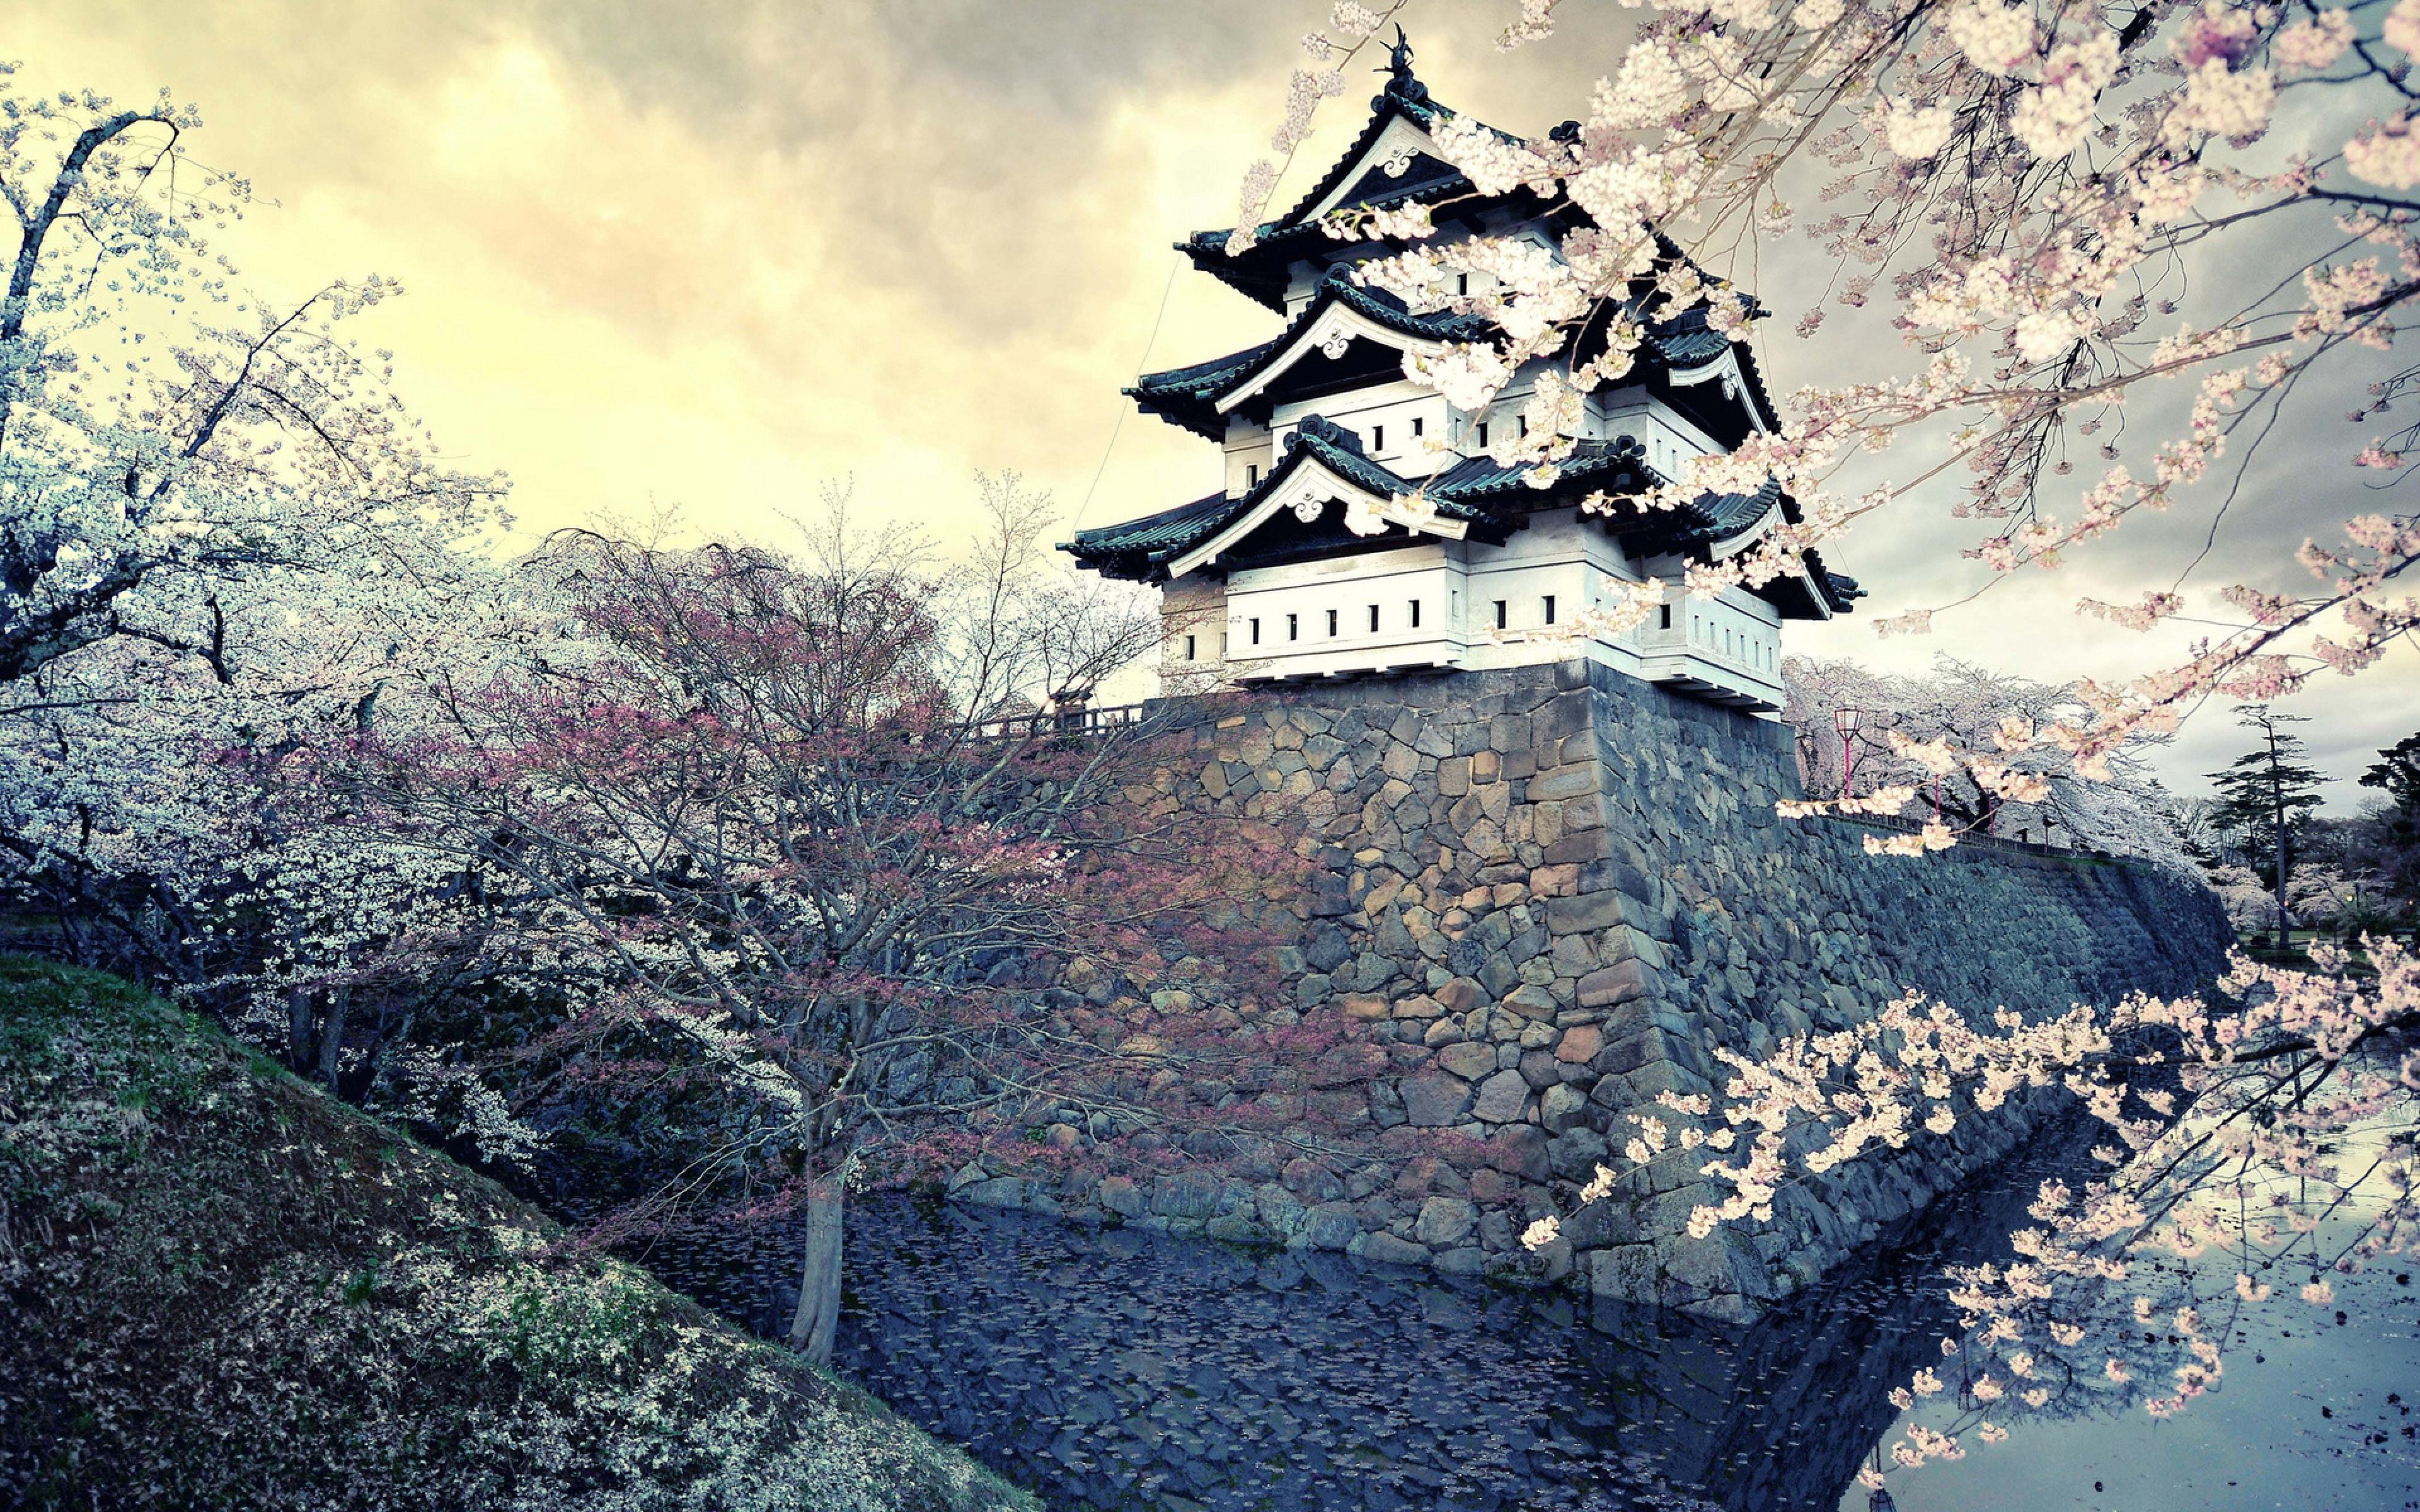 Download Wallpaper 3840x2400 City Sakura Japan Spring Ultra HD 4K 3840x2400